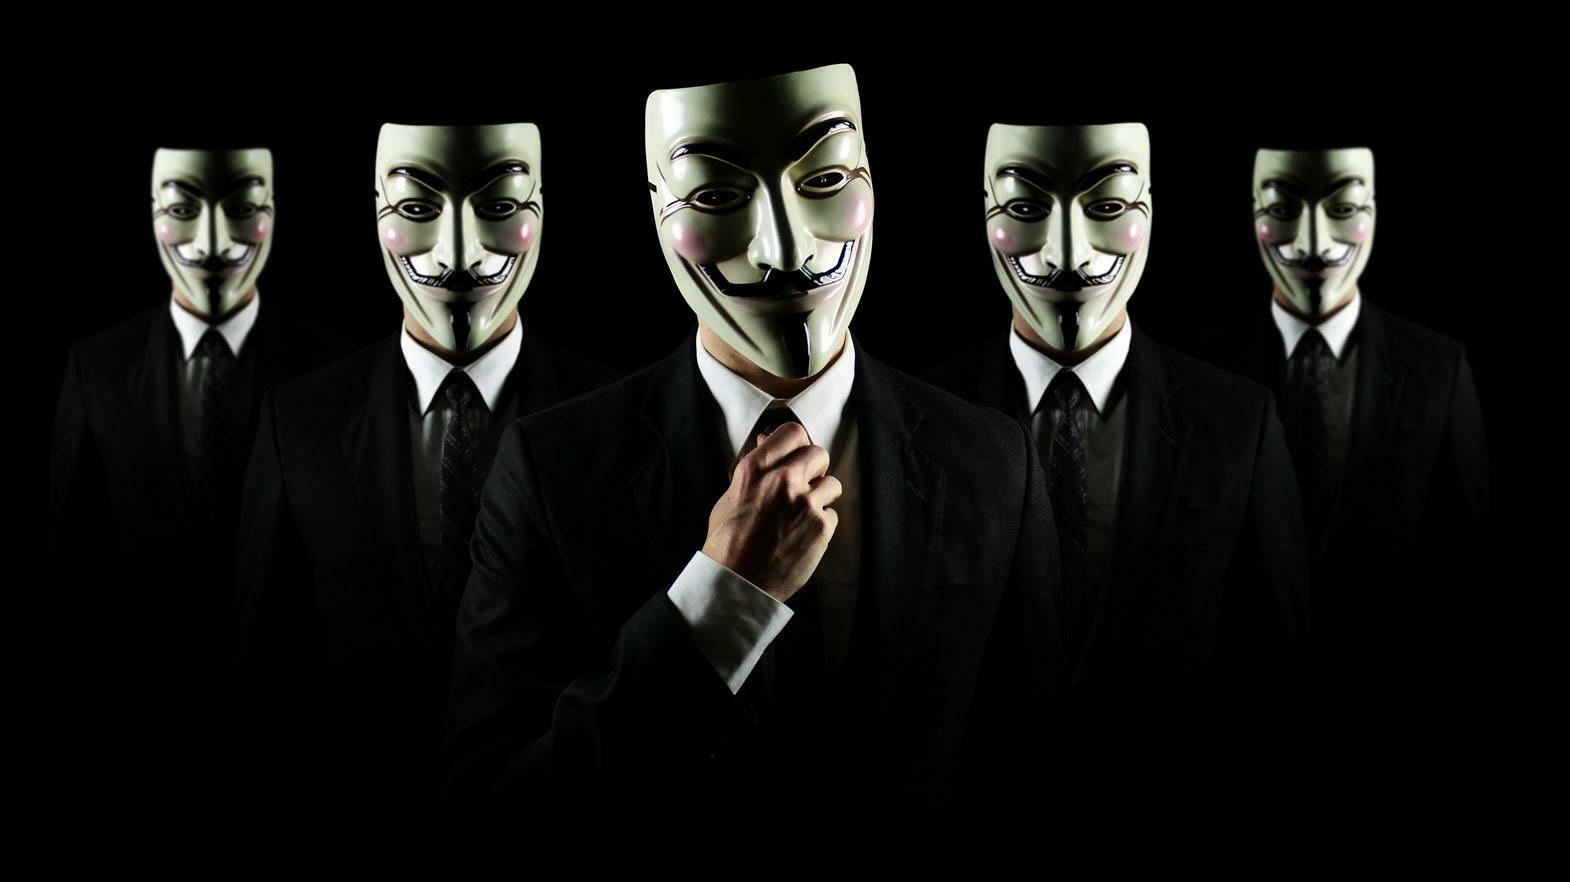 Хактивисты Anonymous выступили против Кита Флинта из The Prodigy (дополнено)